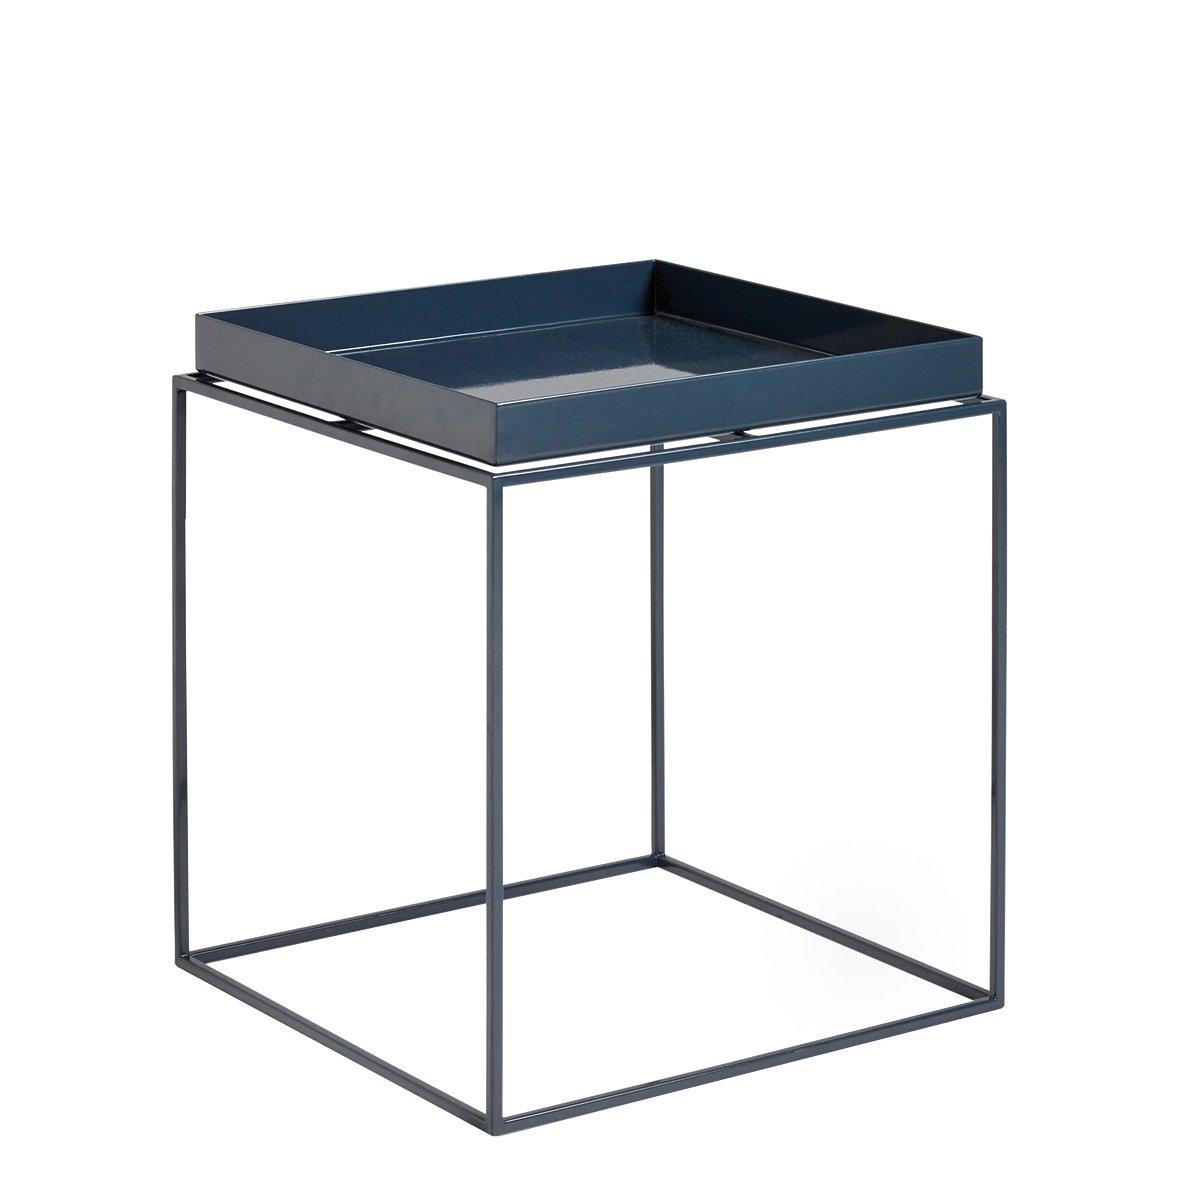 HAY Tray Salontafel - Deep Blue High Gloss 40x40x44